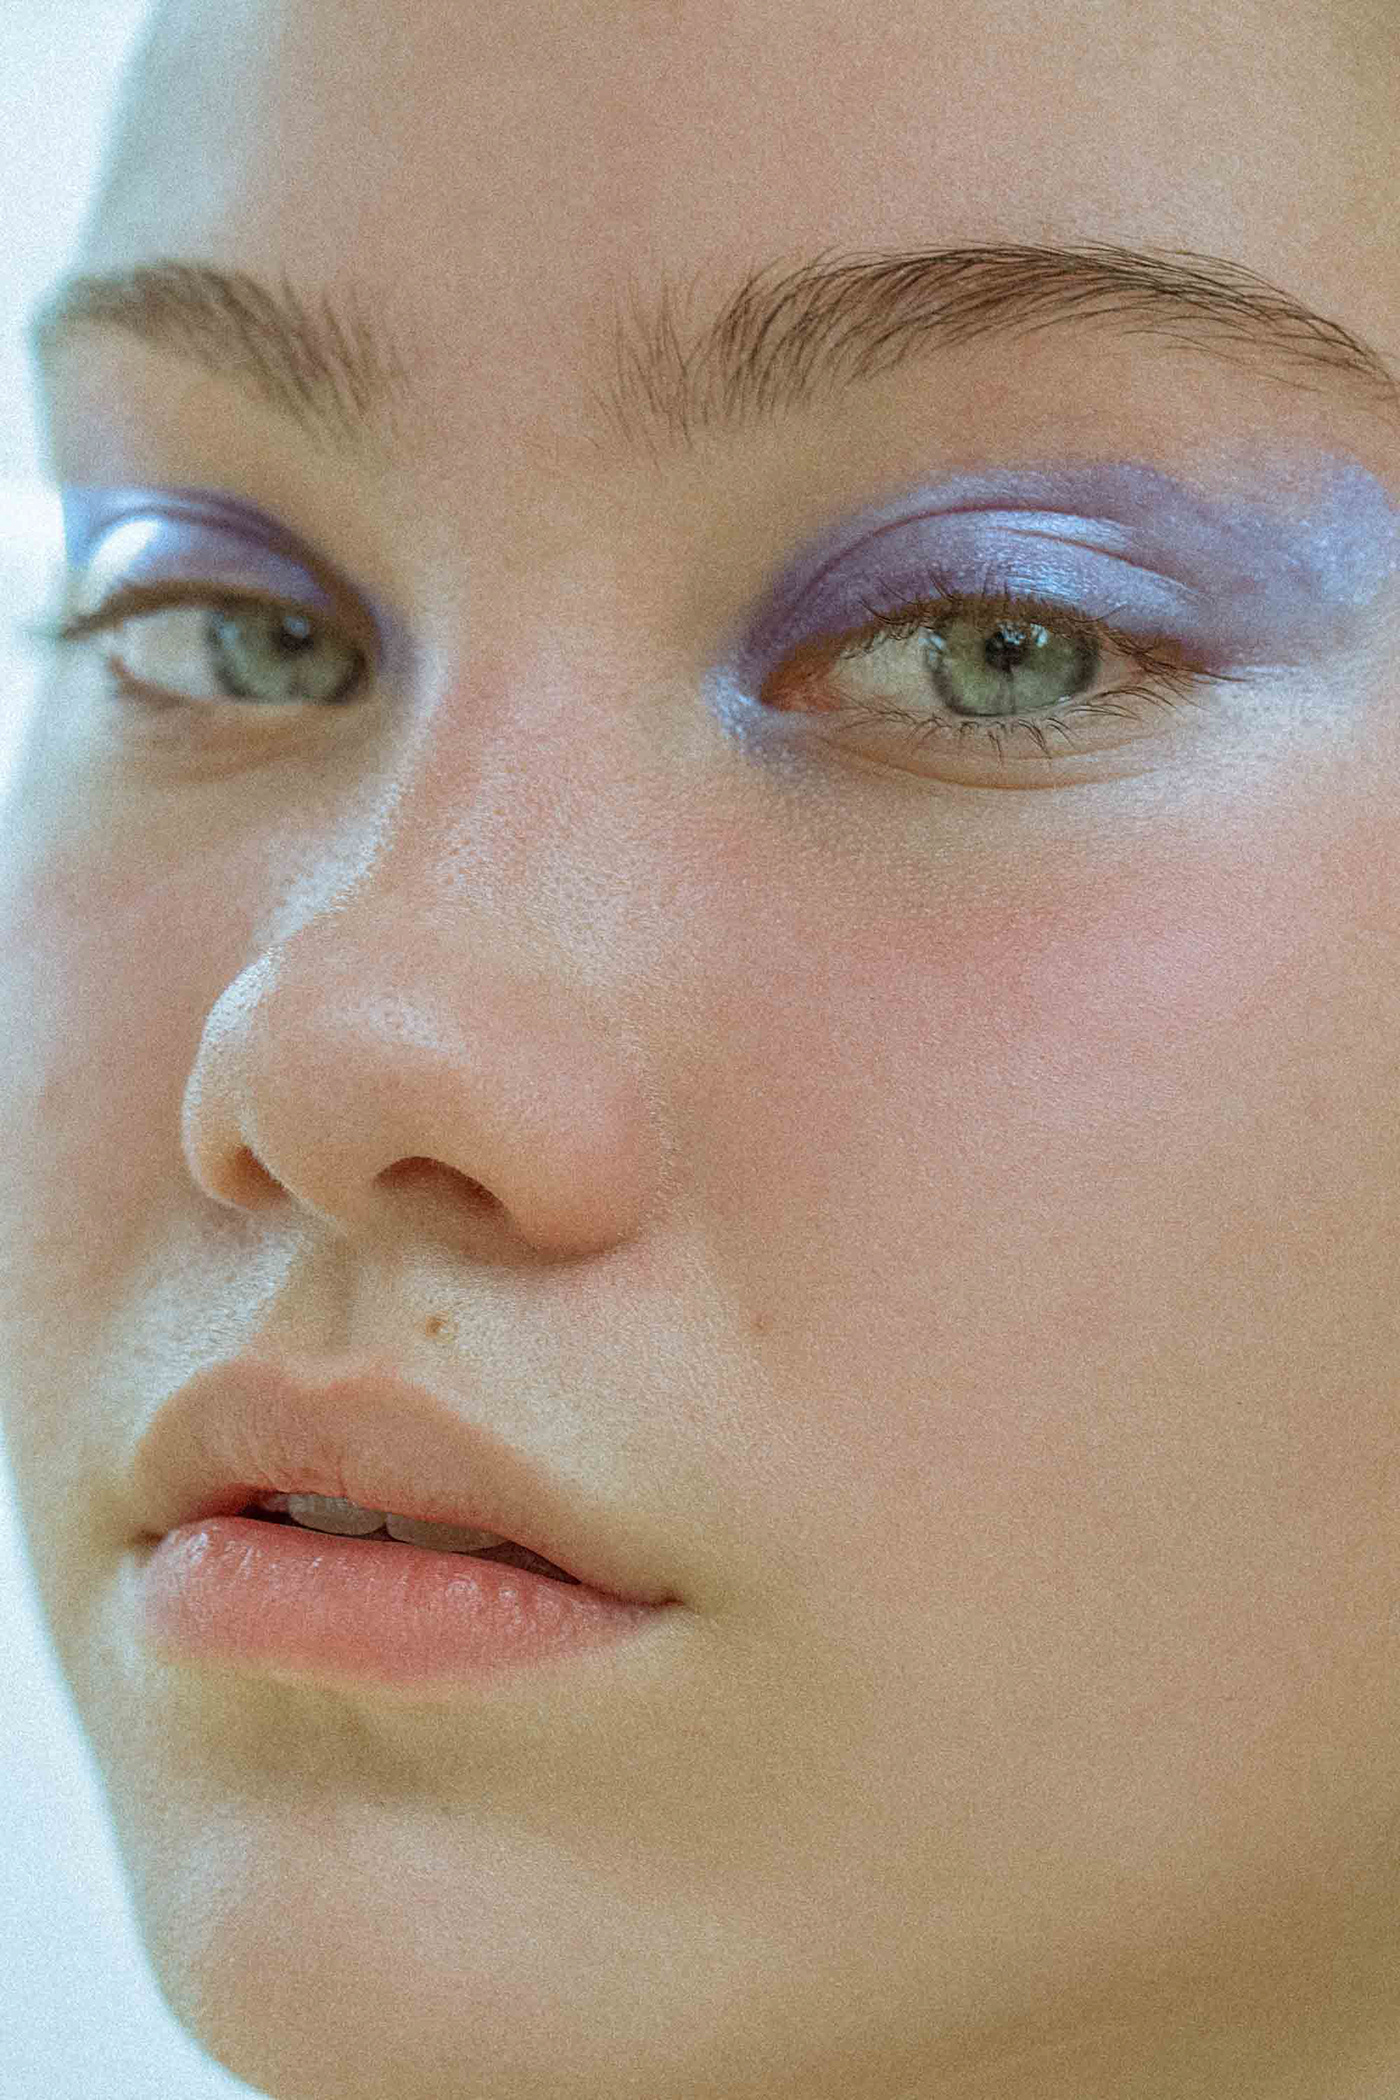 Vogue Beauty Vogue Magazine PhotoVogue beauty photography sigma art 100mm beauty editorial retocuher retouch vogue italia